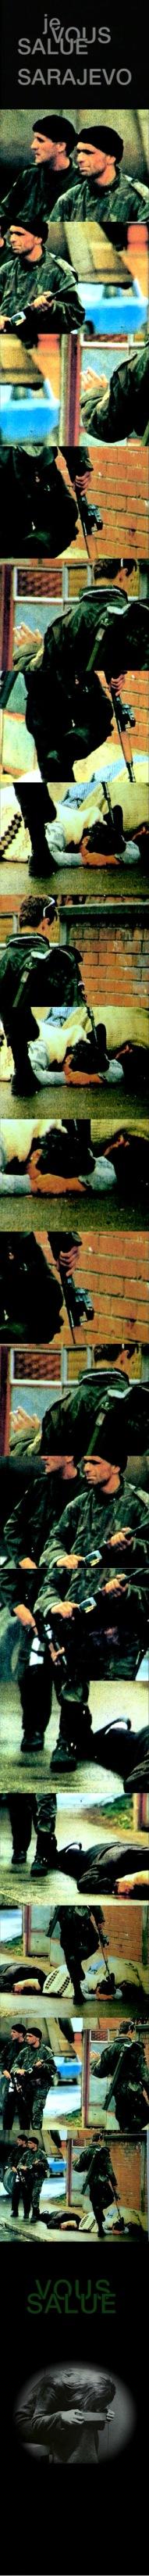 Filmstrip with frame-by-frame rendition of Je Vous Salue Sarajevo of Jean Luc Godard